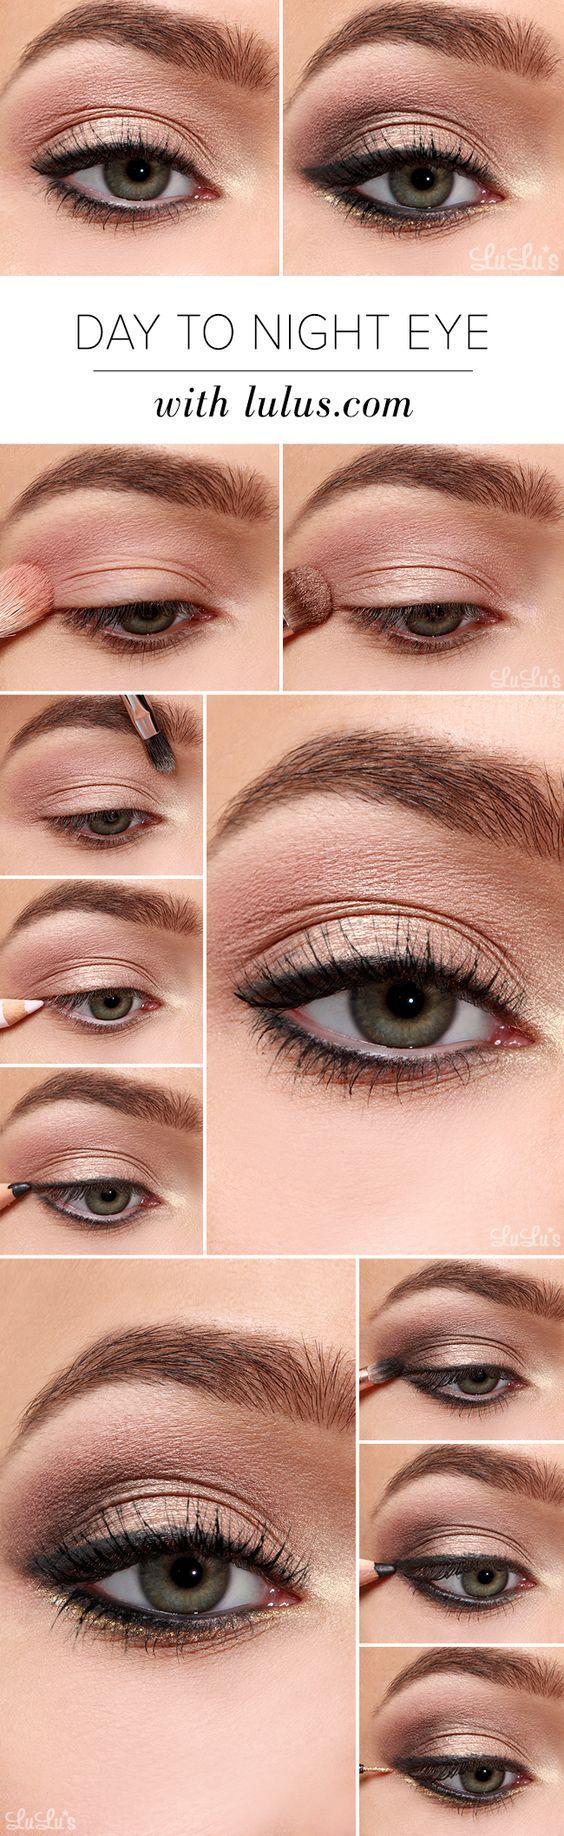 maybelline makeup tutorial for dark skin